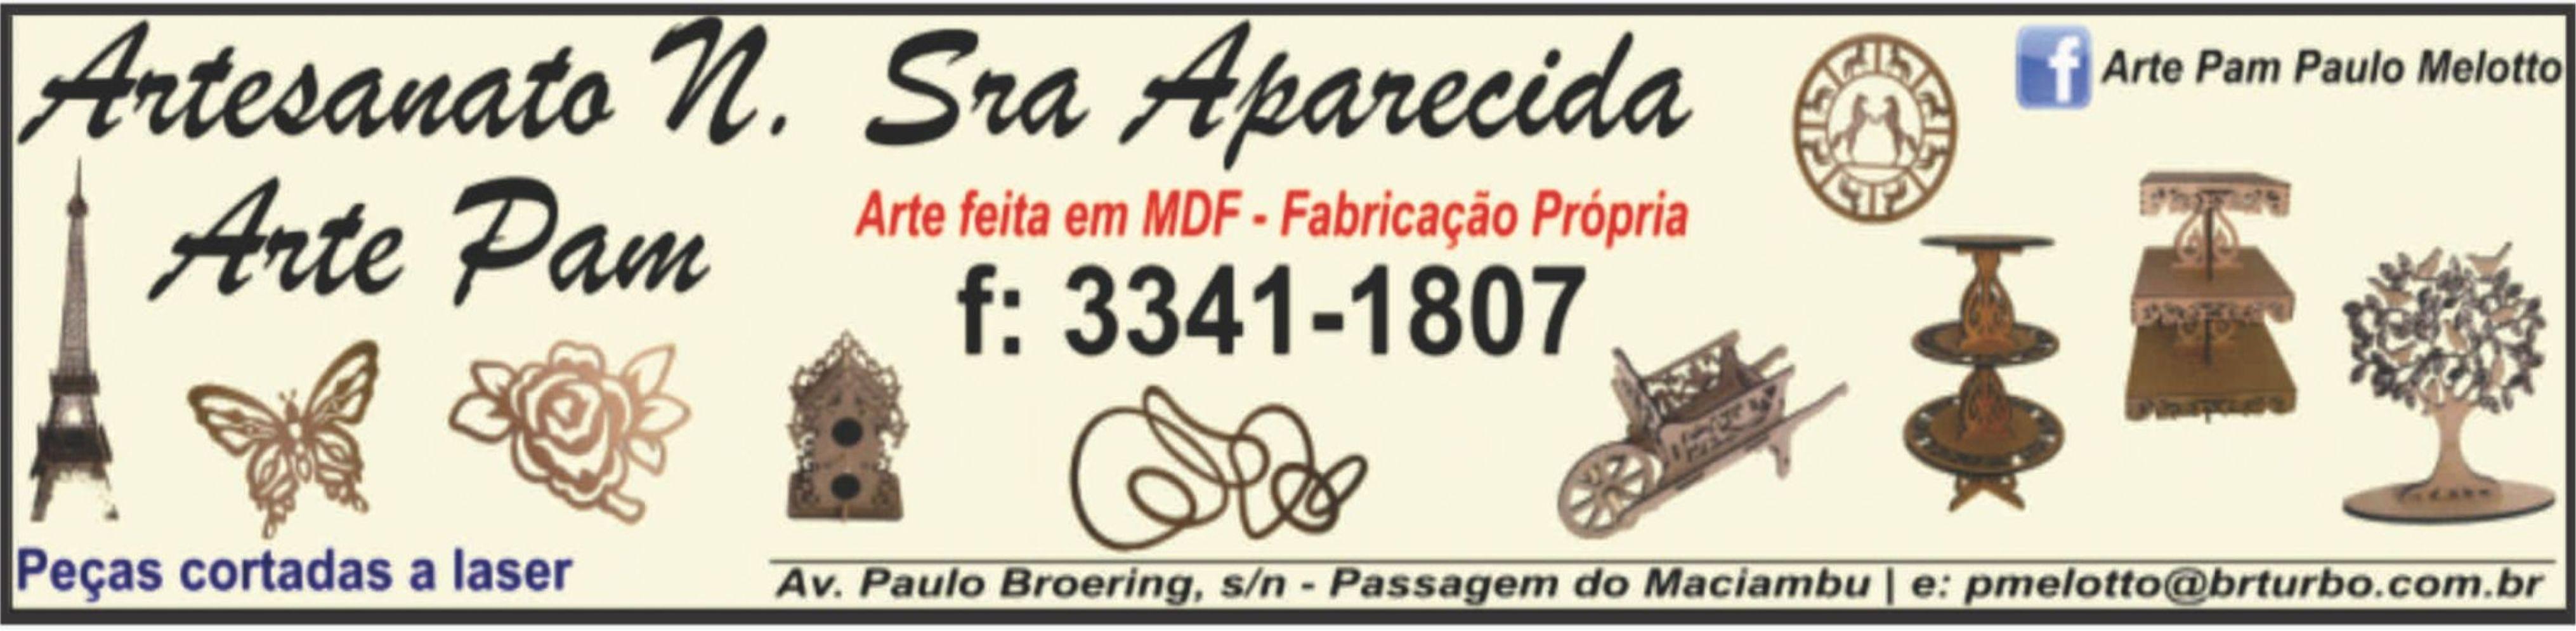 Artesanato Nª Sra. Aparecida - Arte Pam